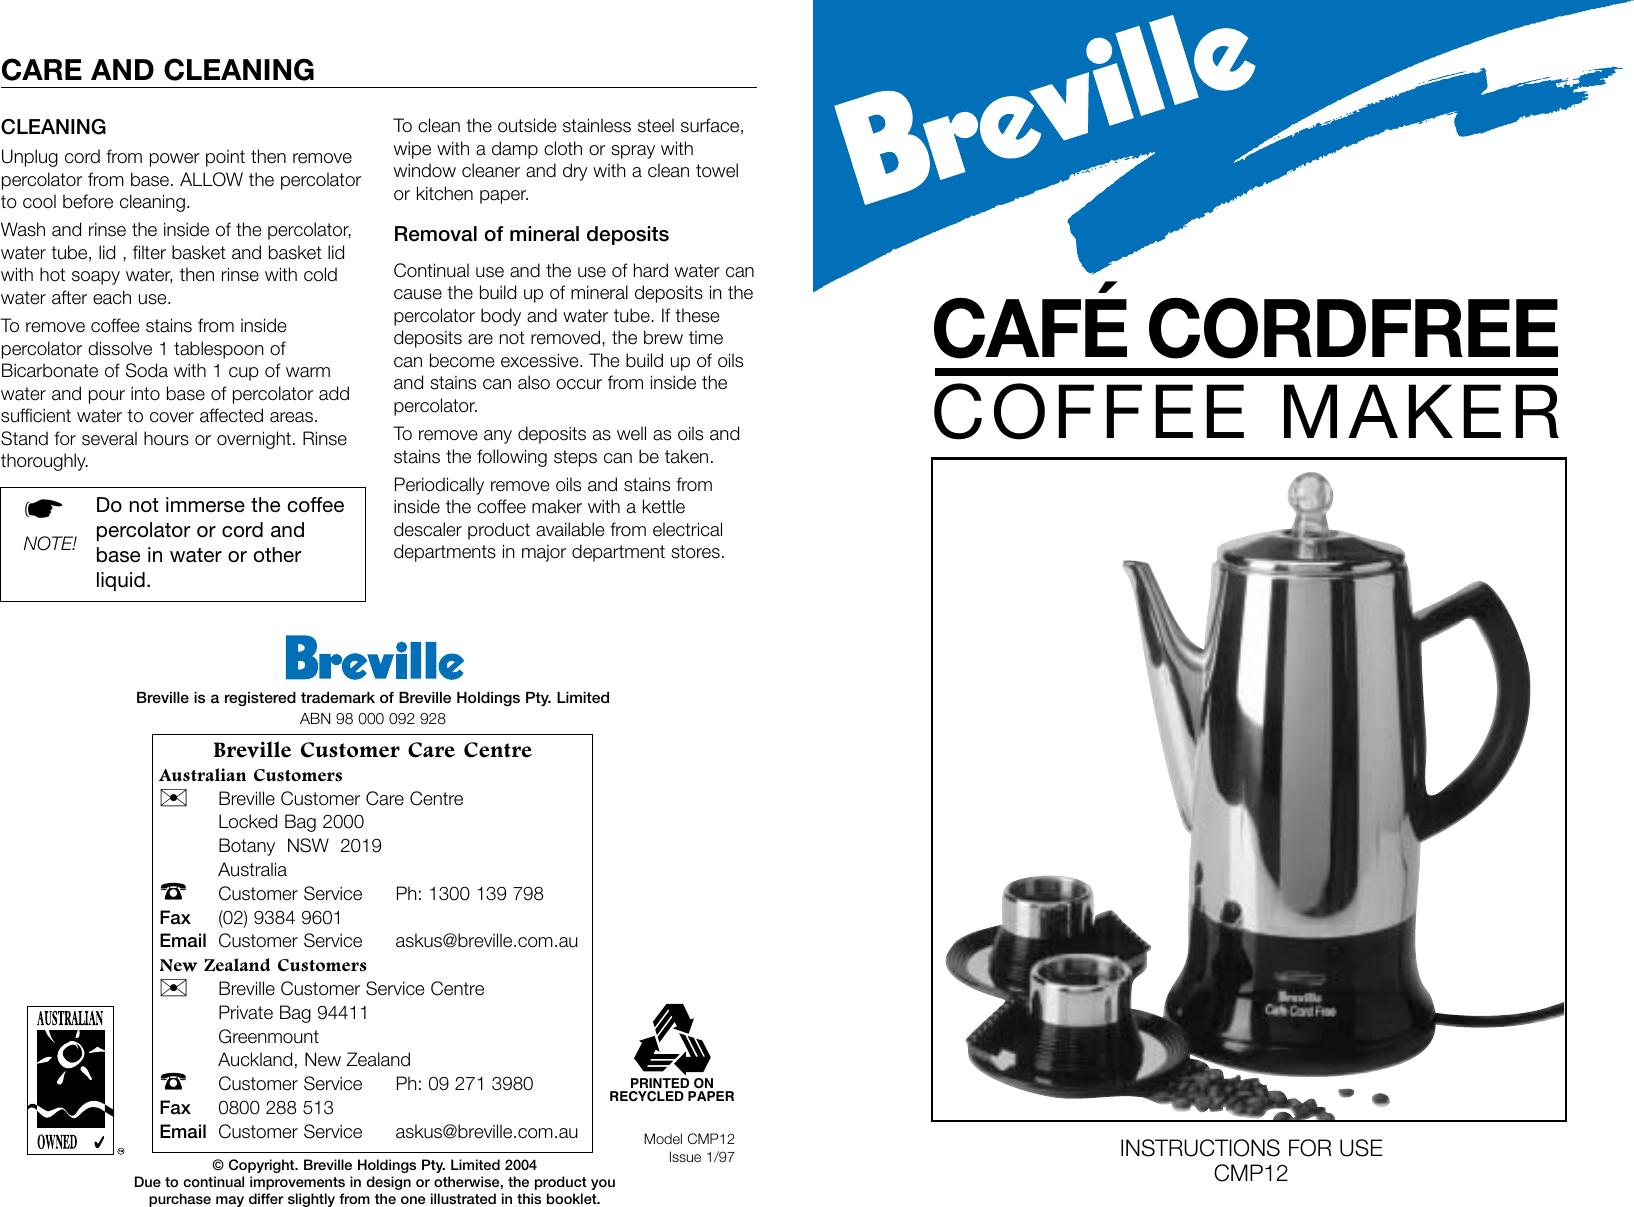 Breville Cmp12 User Manual E8a55a1c A464 4bed A948 0f3efcc7bc87